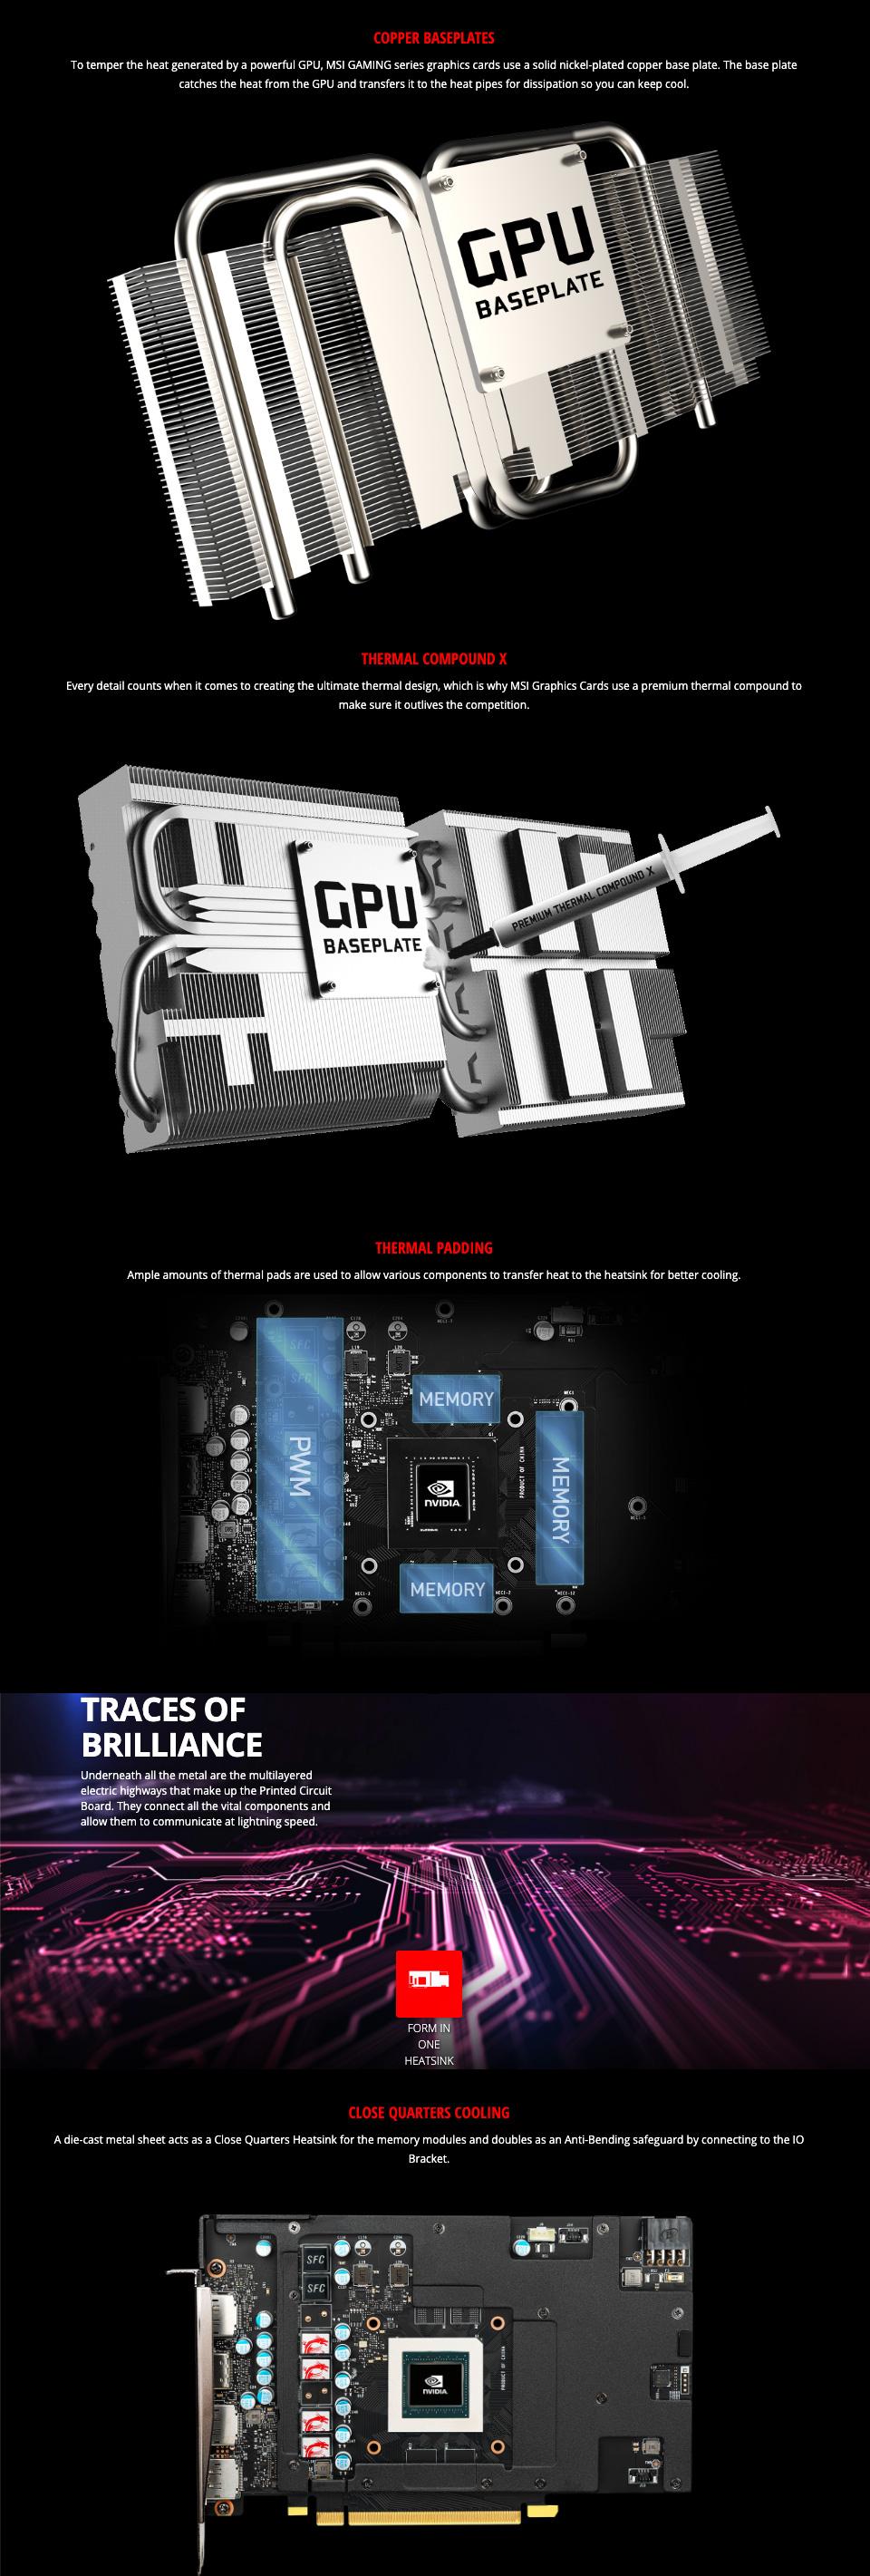 MSI GeForce GTX 1660 Super Gaming X 6GB features 4